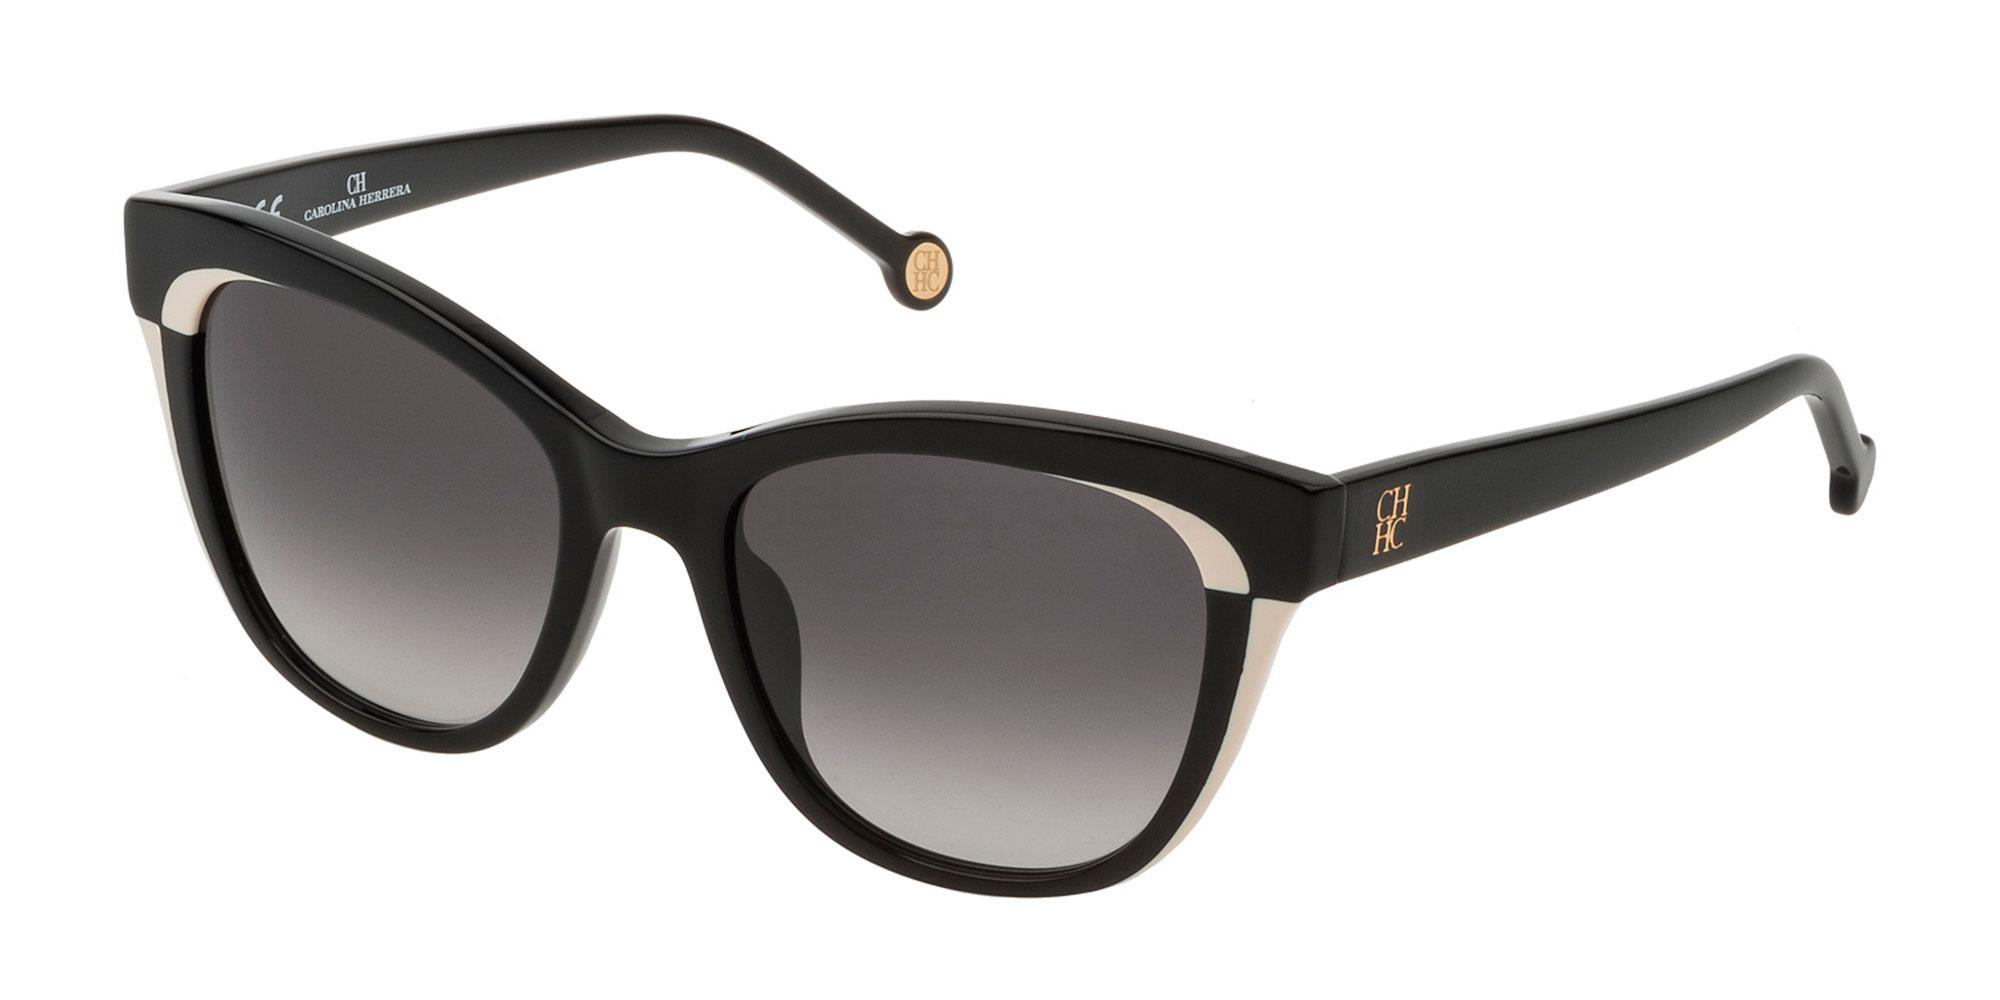 0700 SHE787 Sunglasses, CH Carolina Herrera